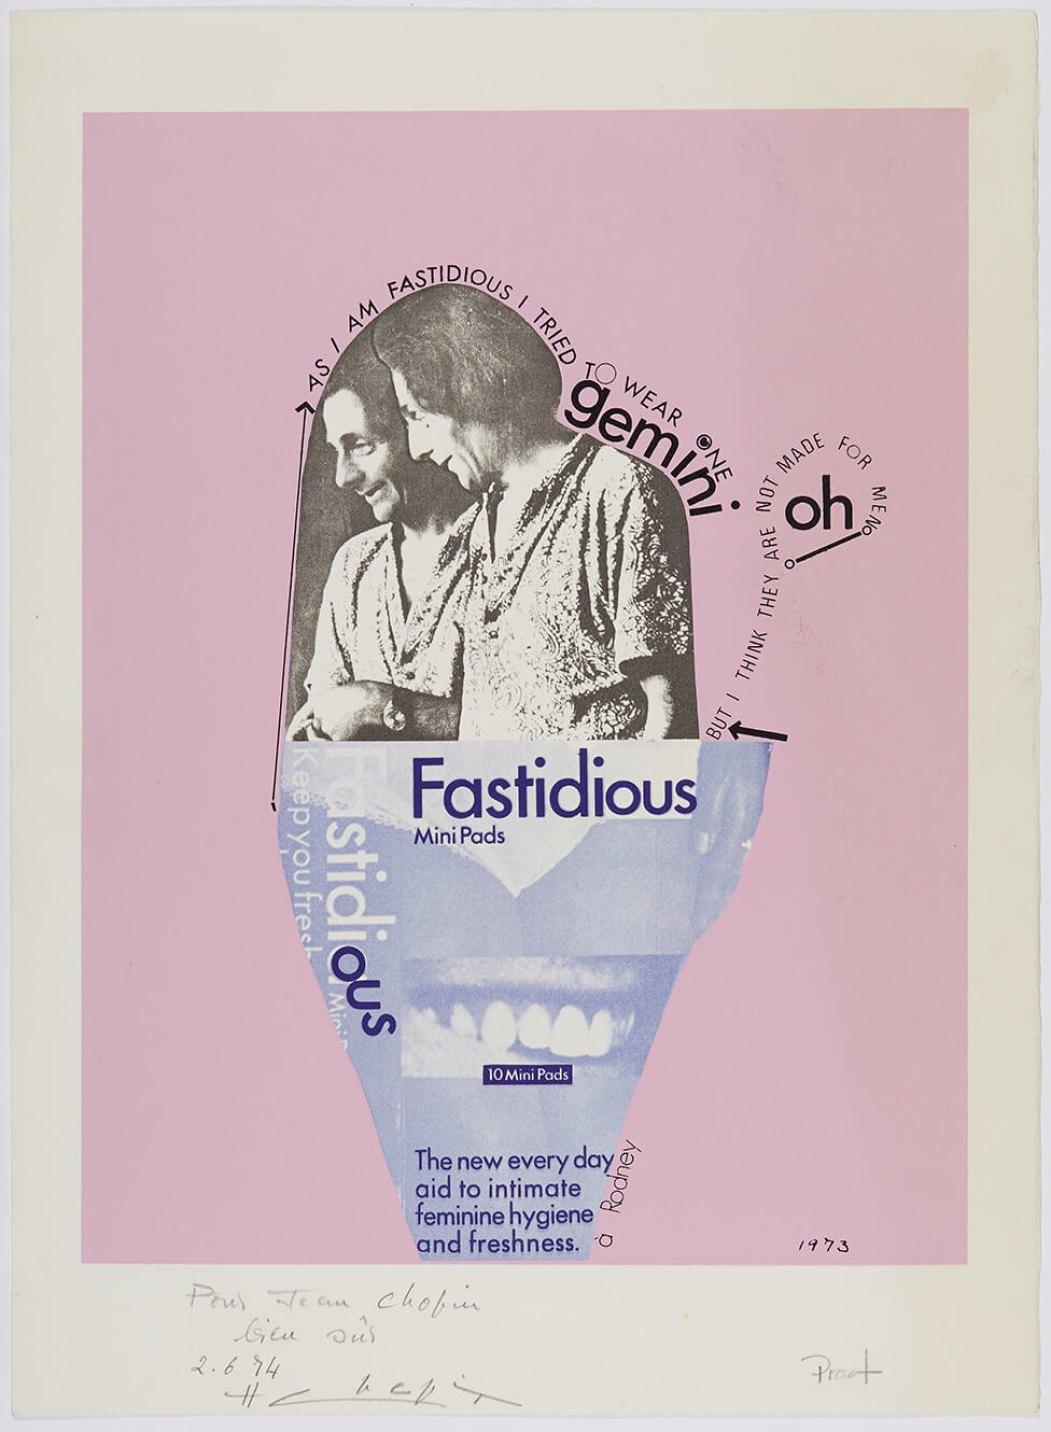 Henri Chopin,<em>Fastidious</em>,1974,color print on paper,38 × 27,9 cm - Mendes Wood DM